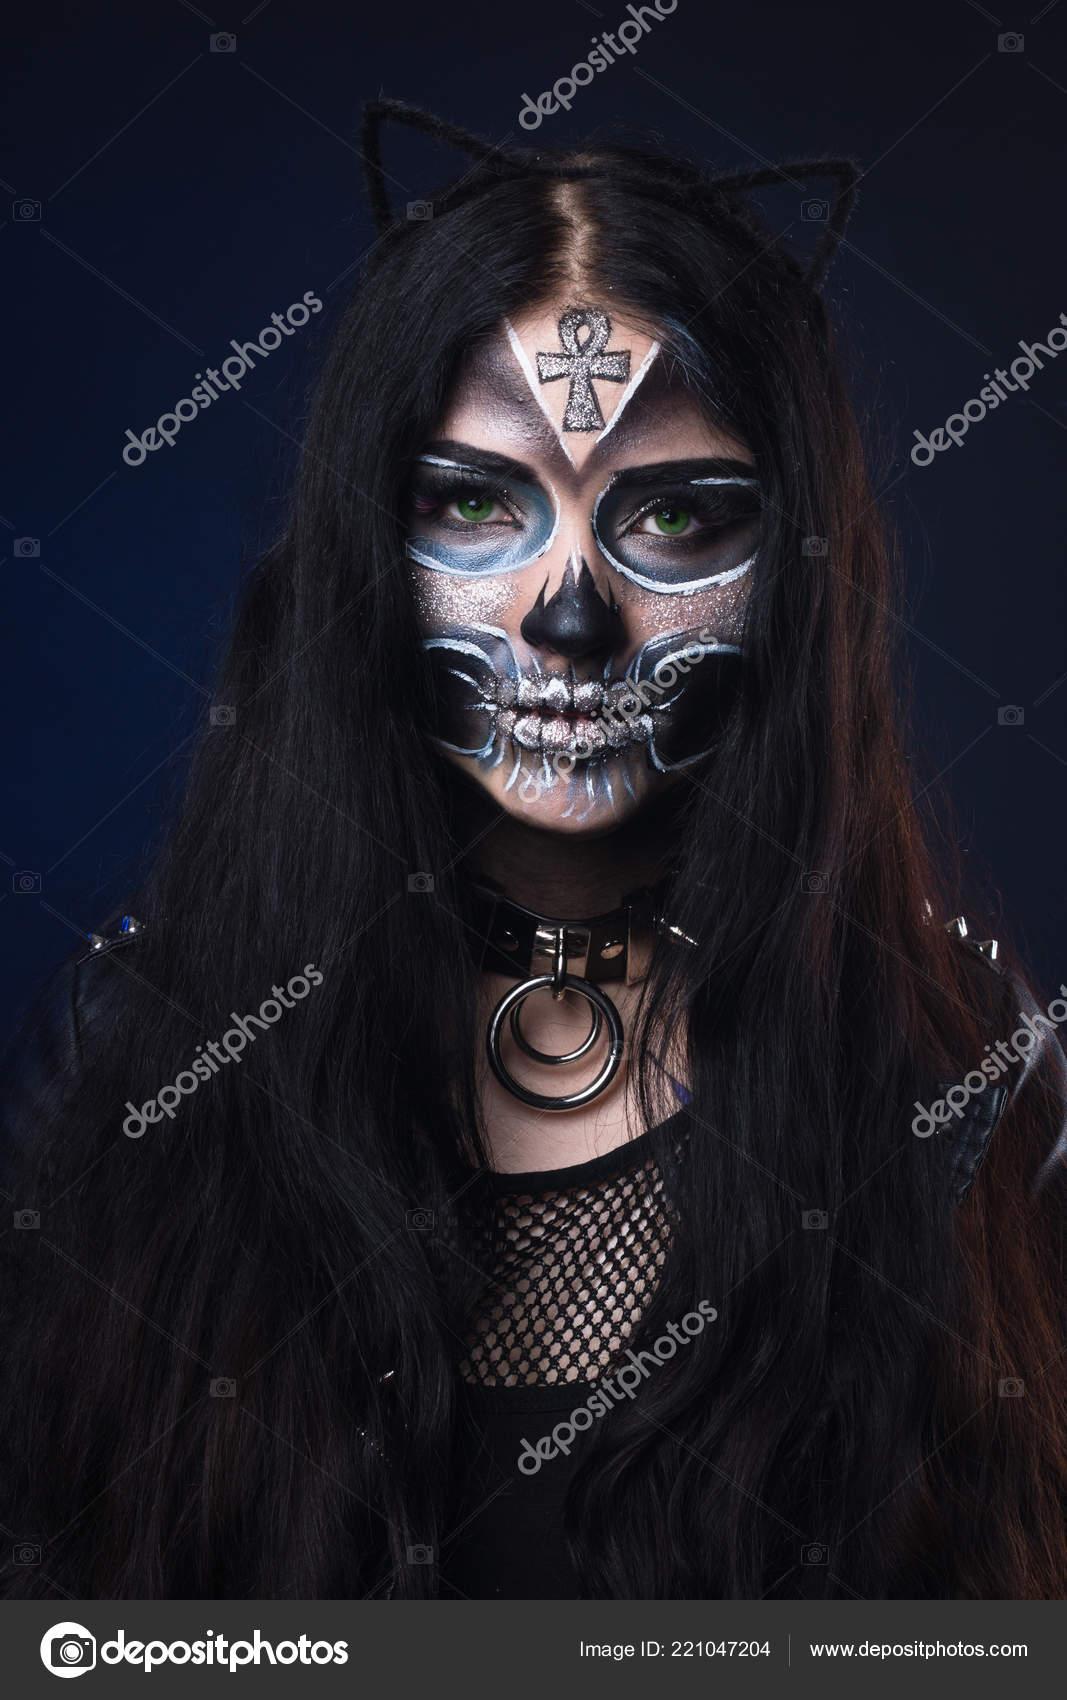 Halloween Sminkek.Smink Halloween Maszk Santa Muerte Mexikoi Folklor Stock